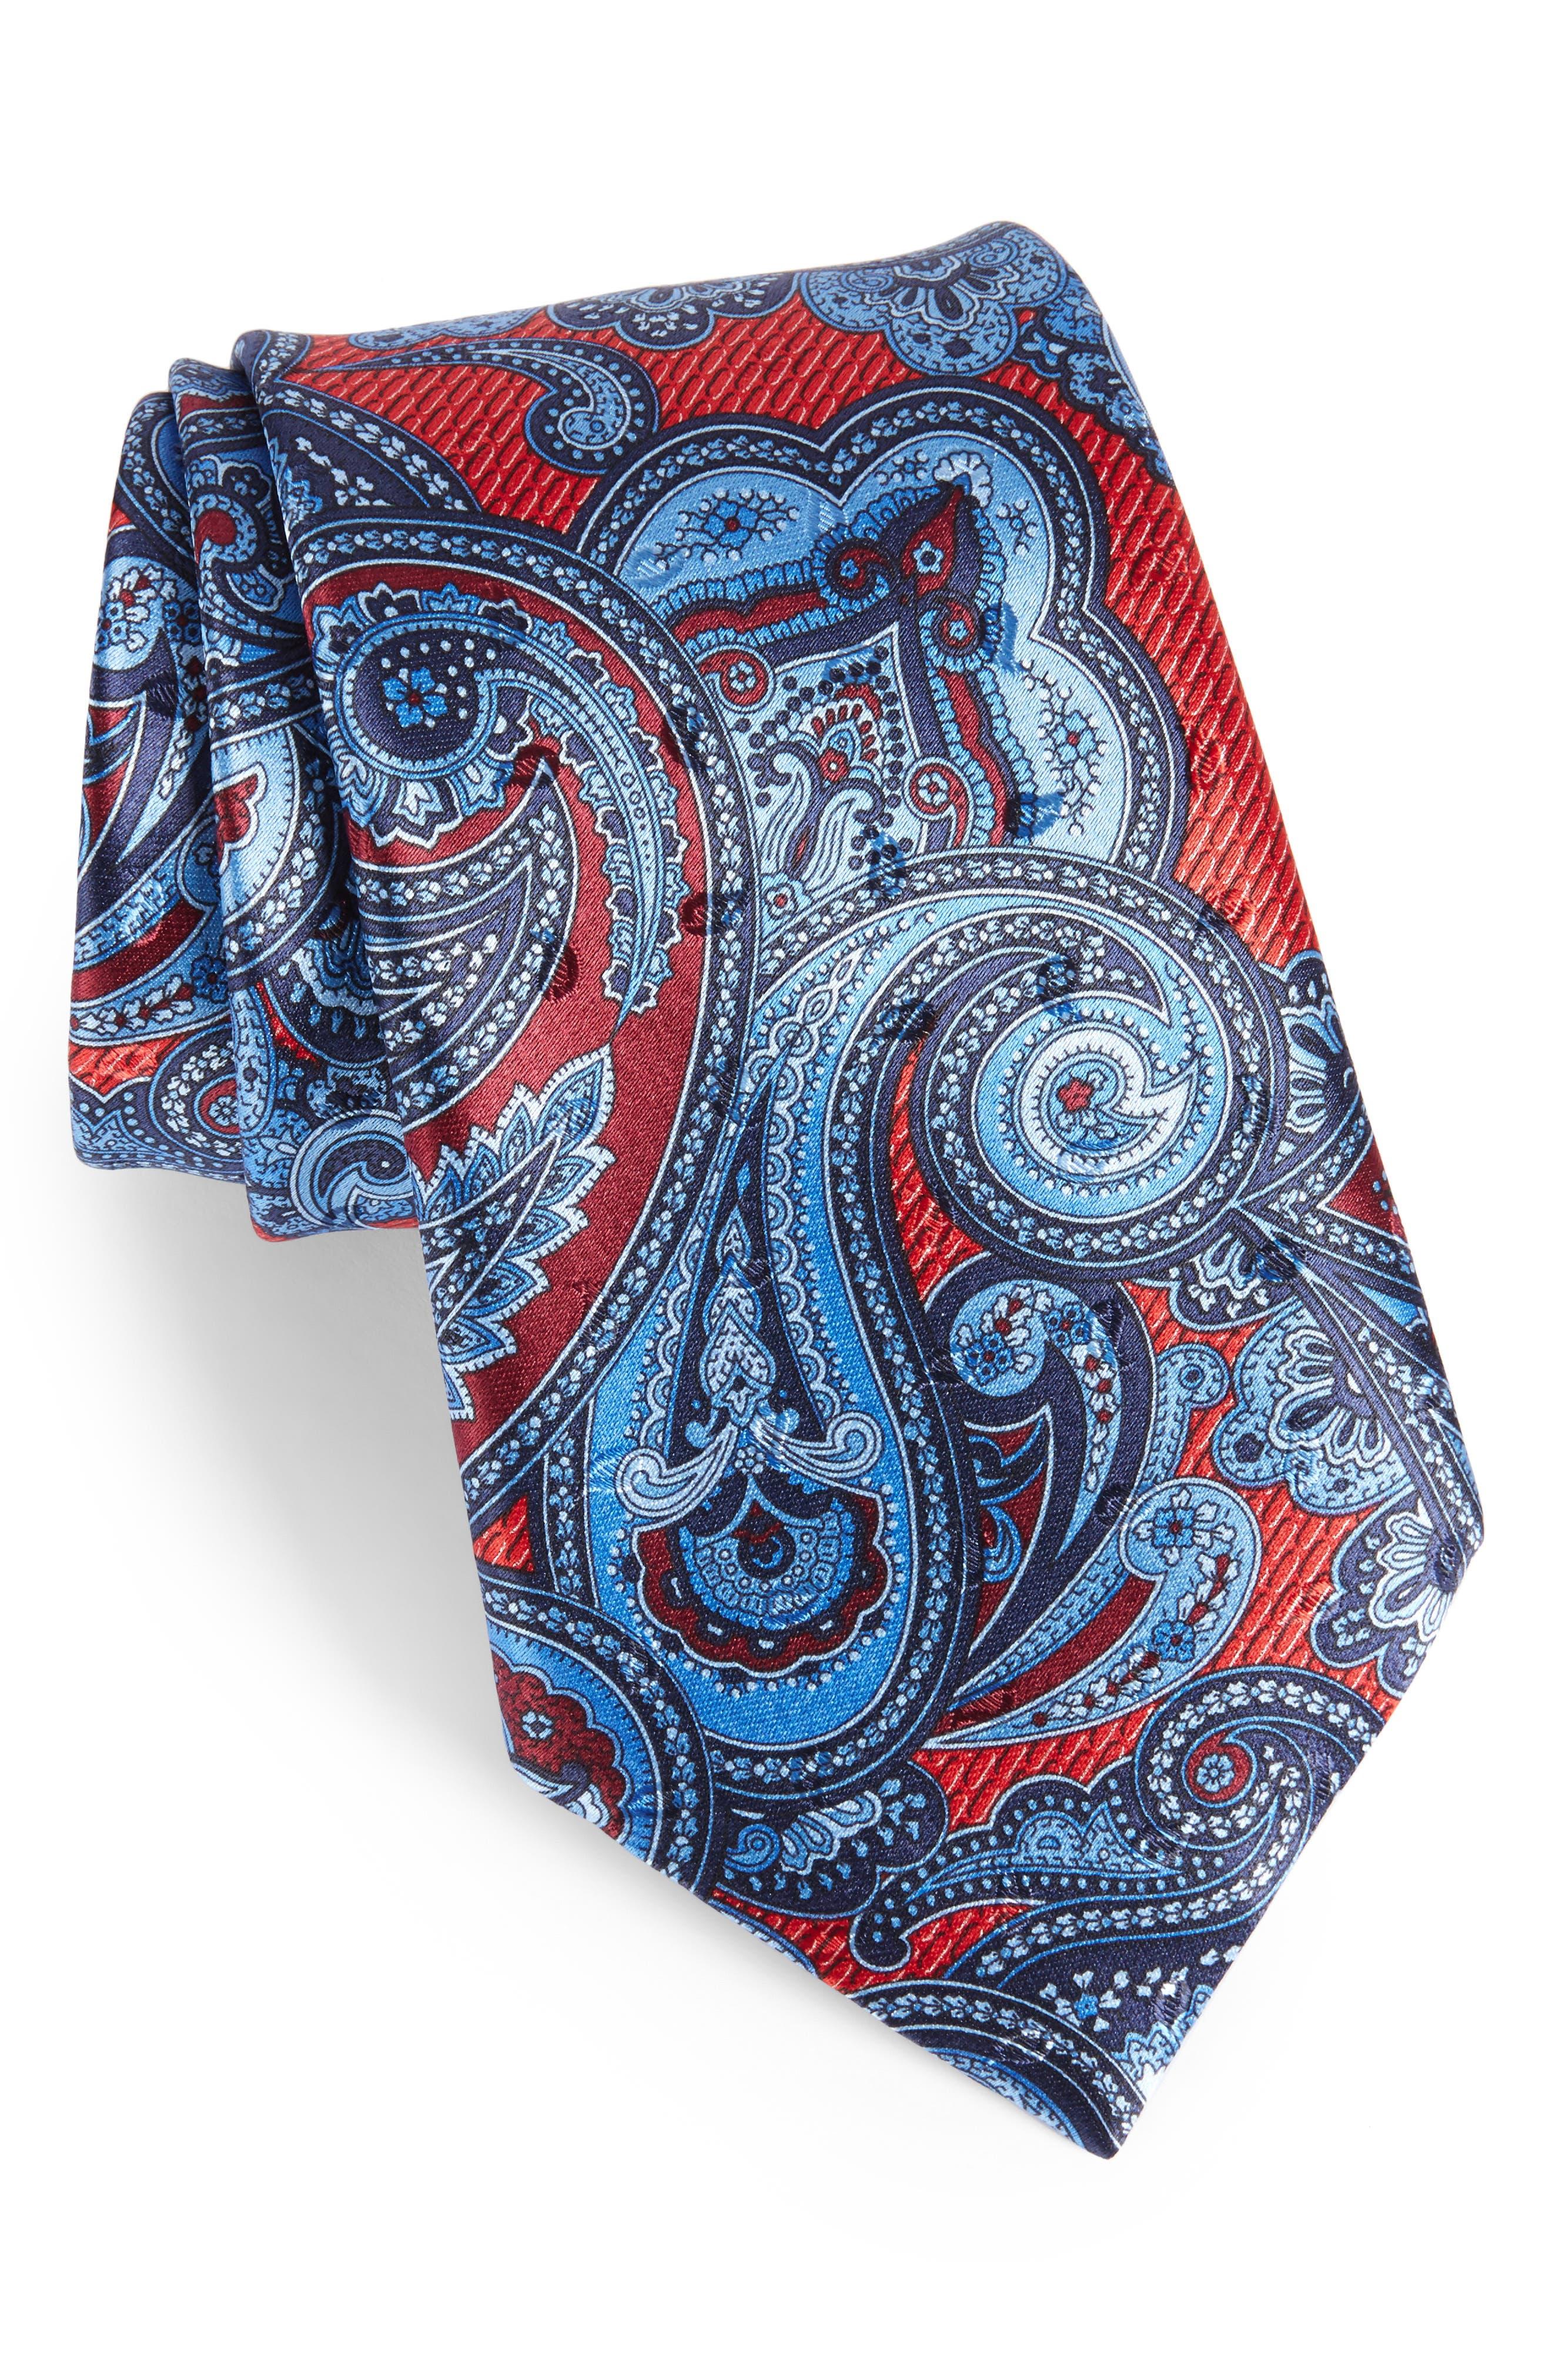 Main Image - Ermenegildo Zegna Paisley Silk Tie